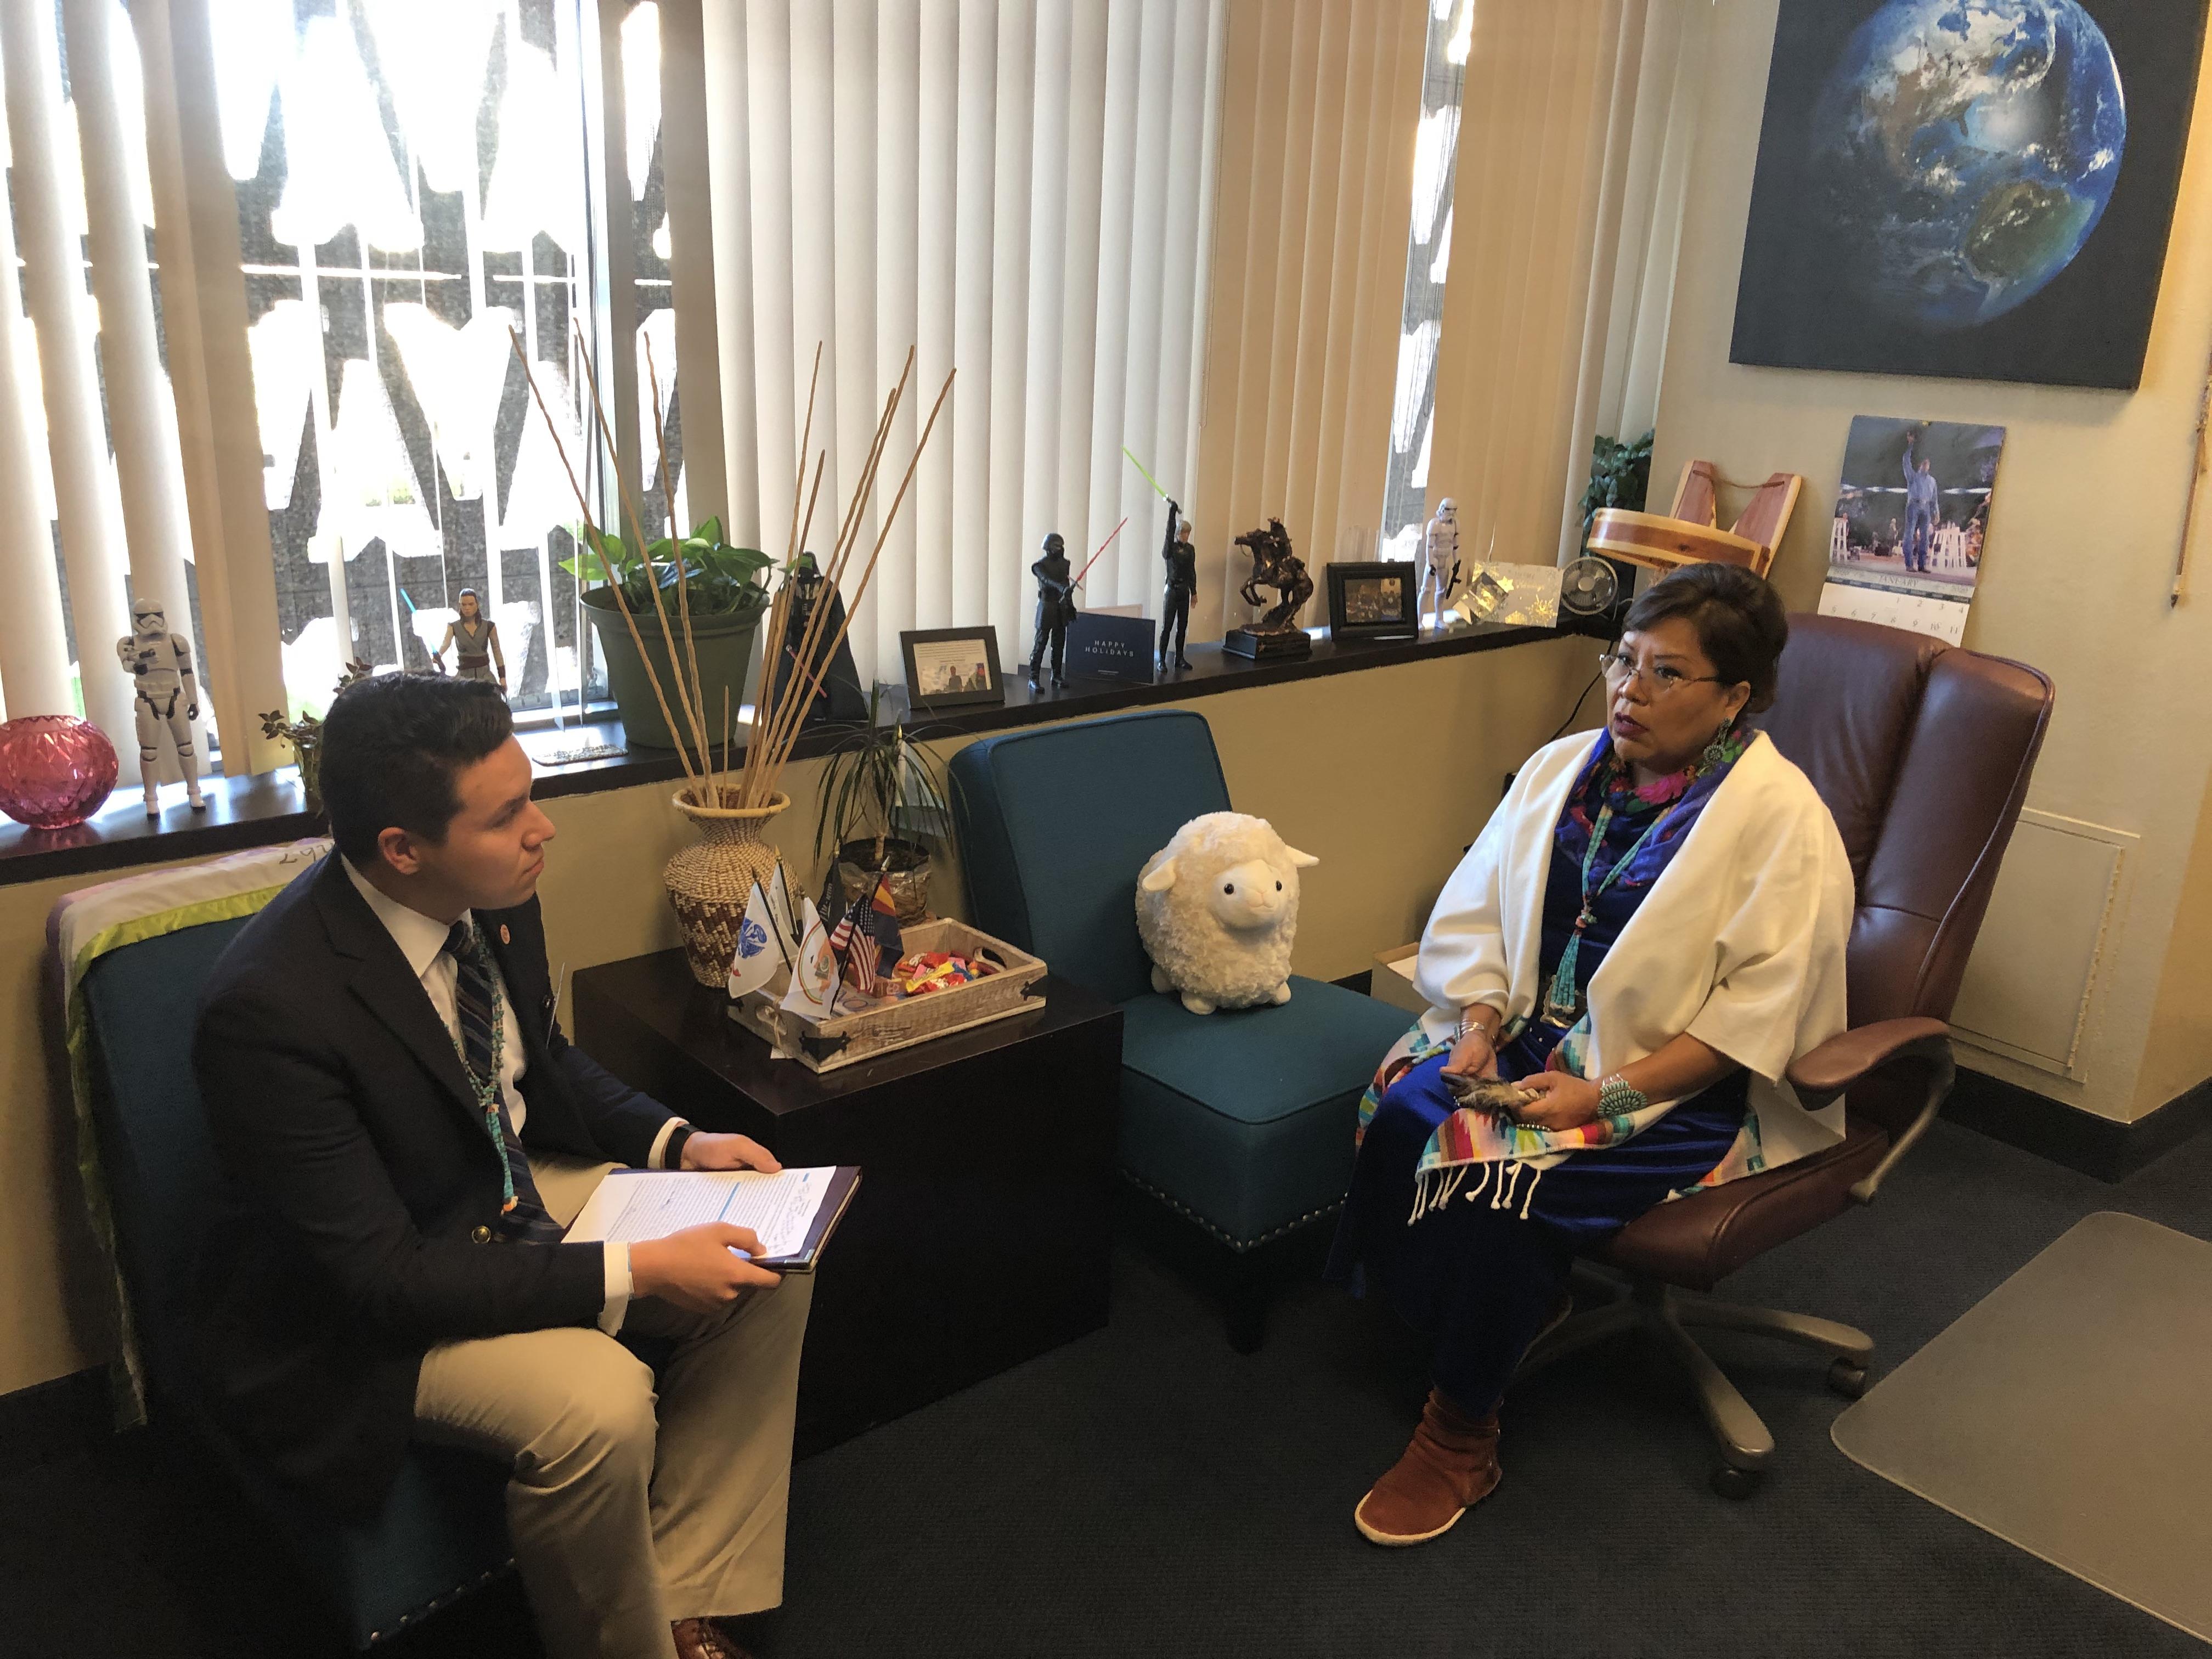 Meeting with Senator Peshlakai